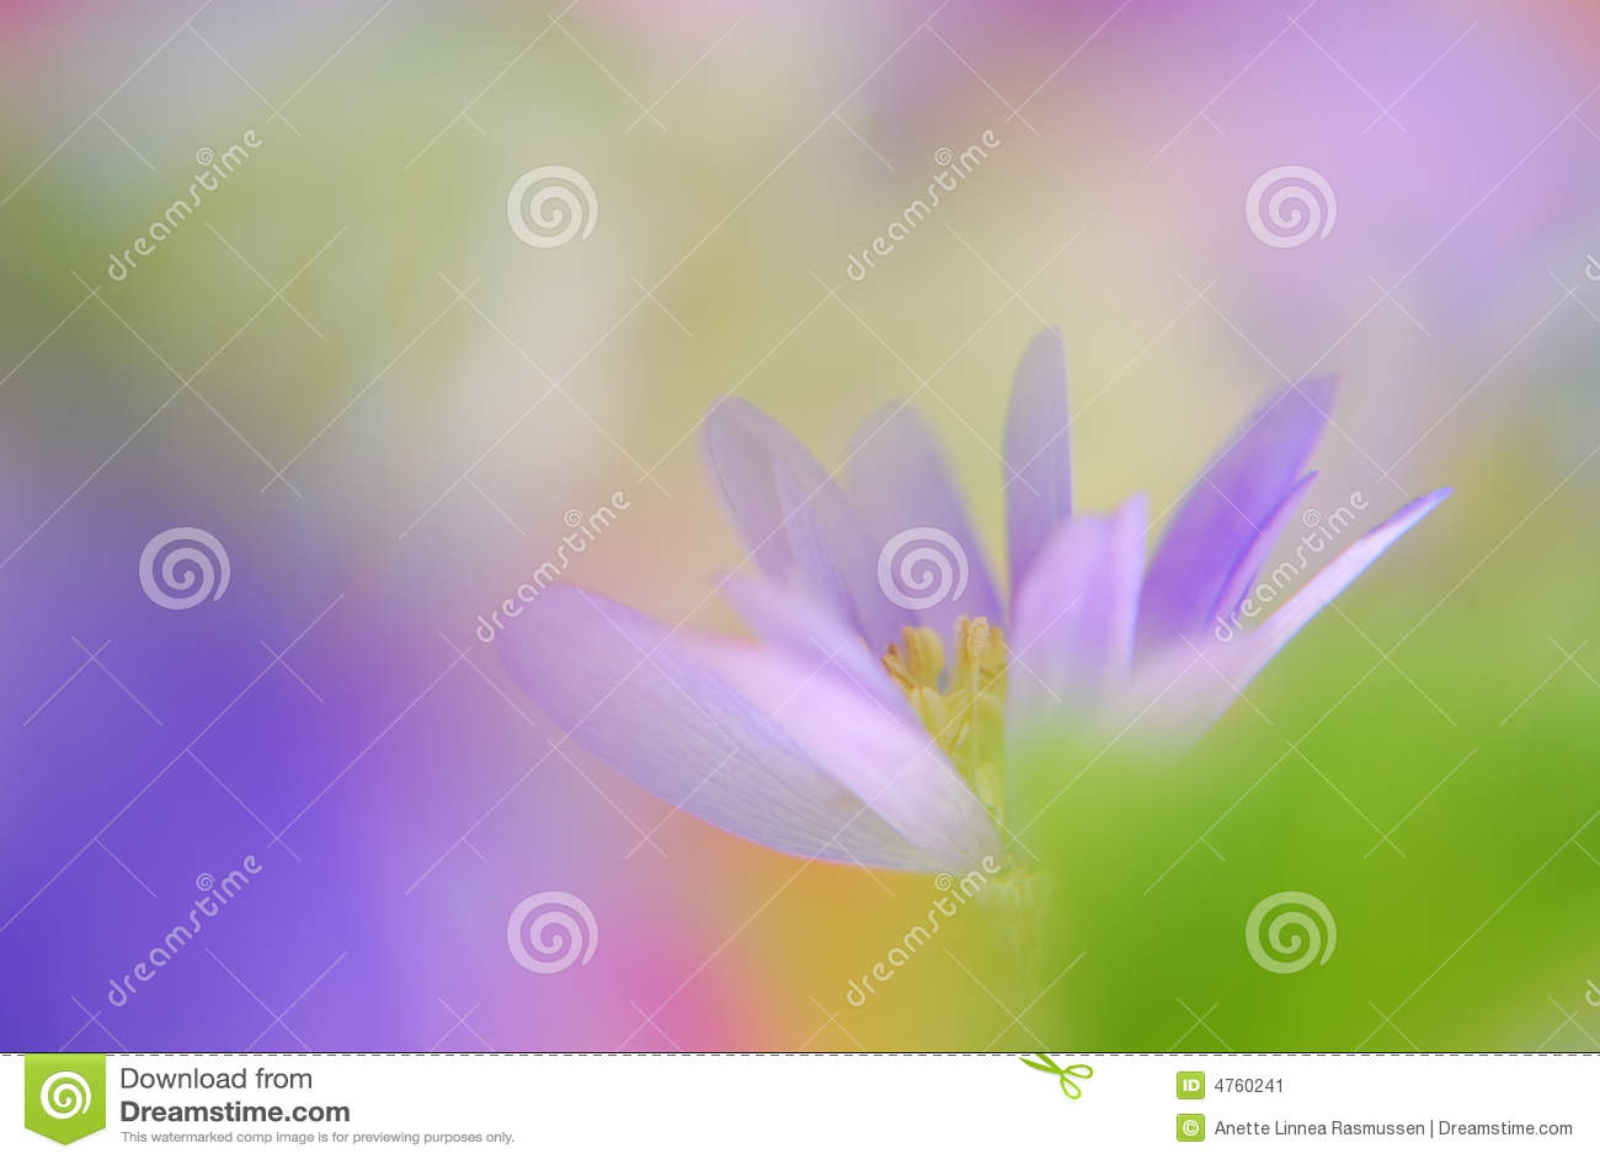 Soft blue anemone